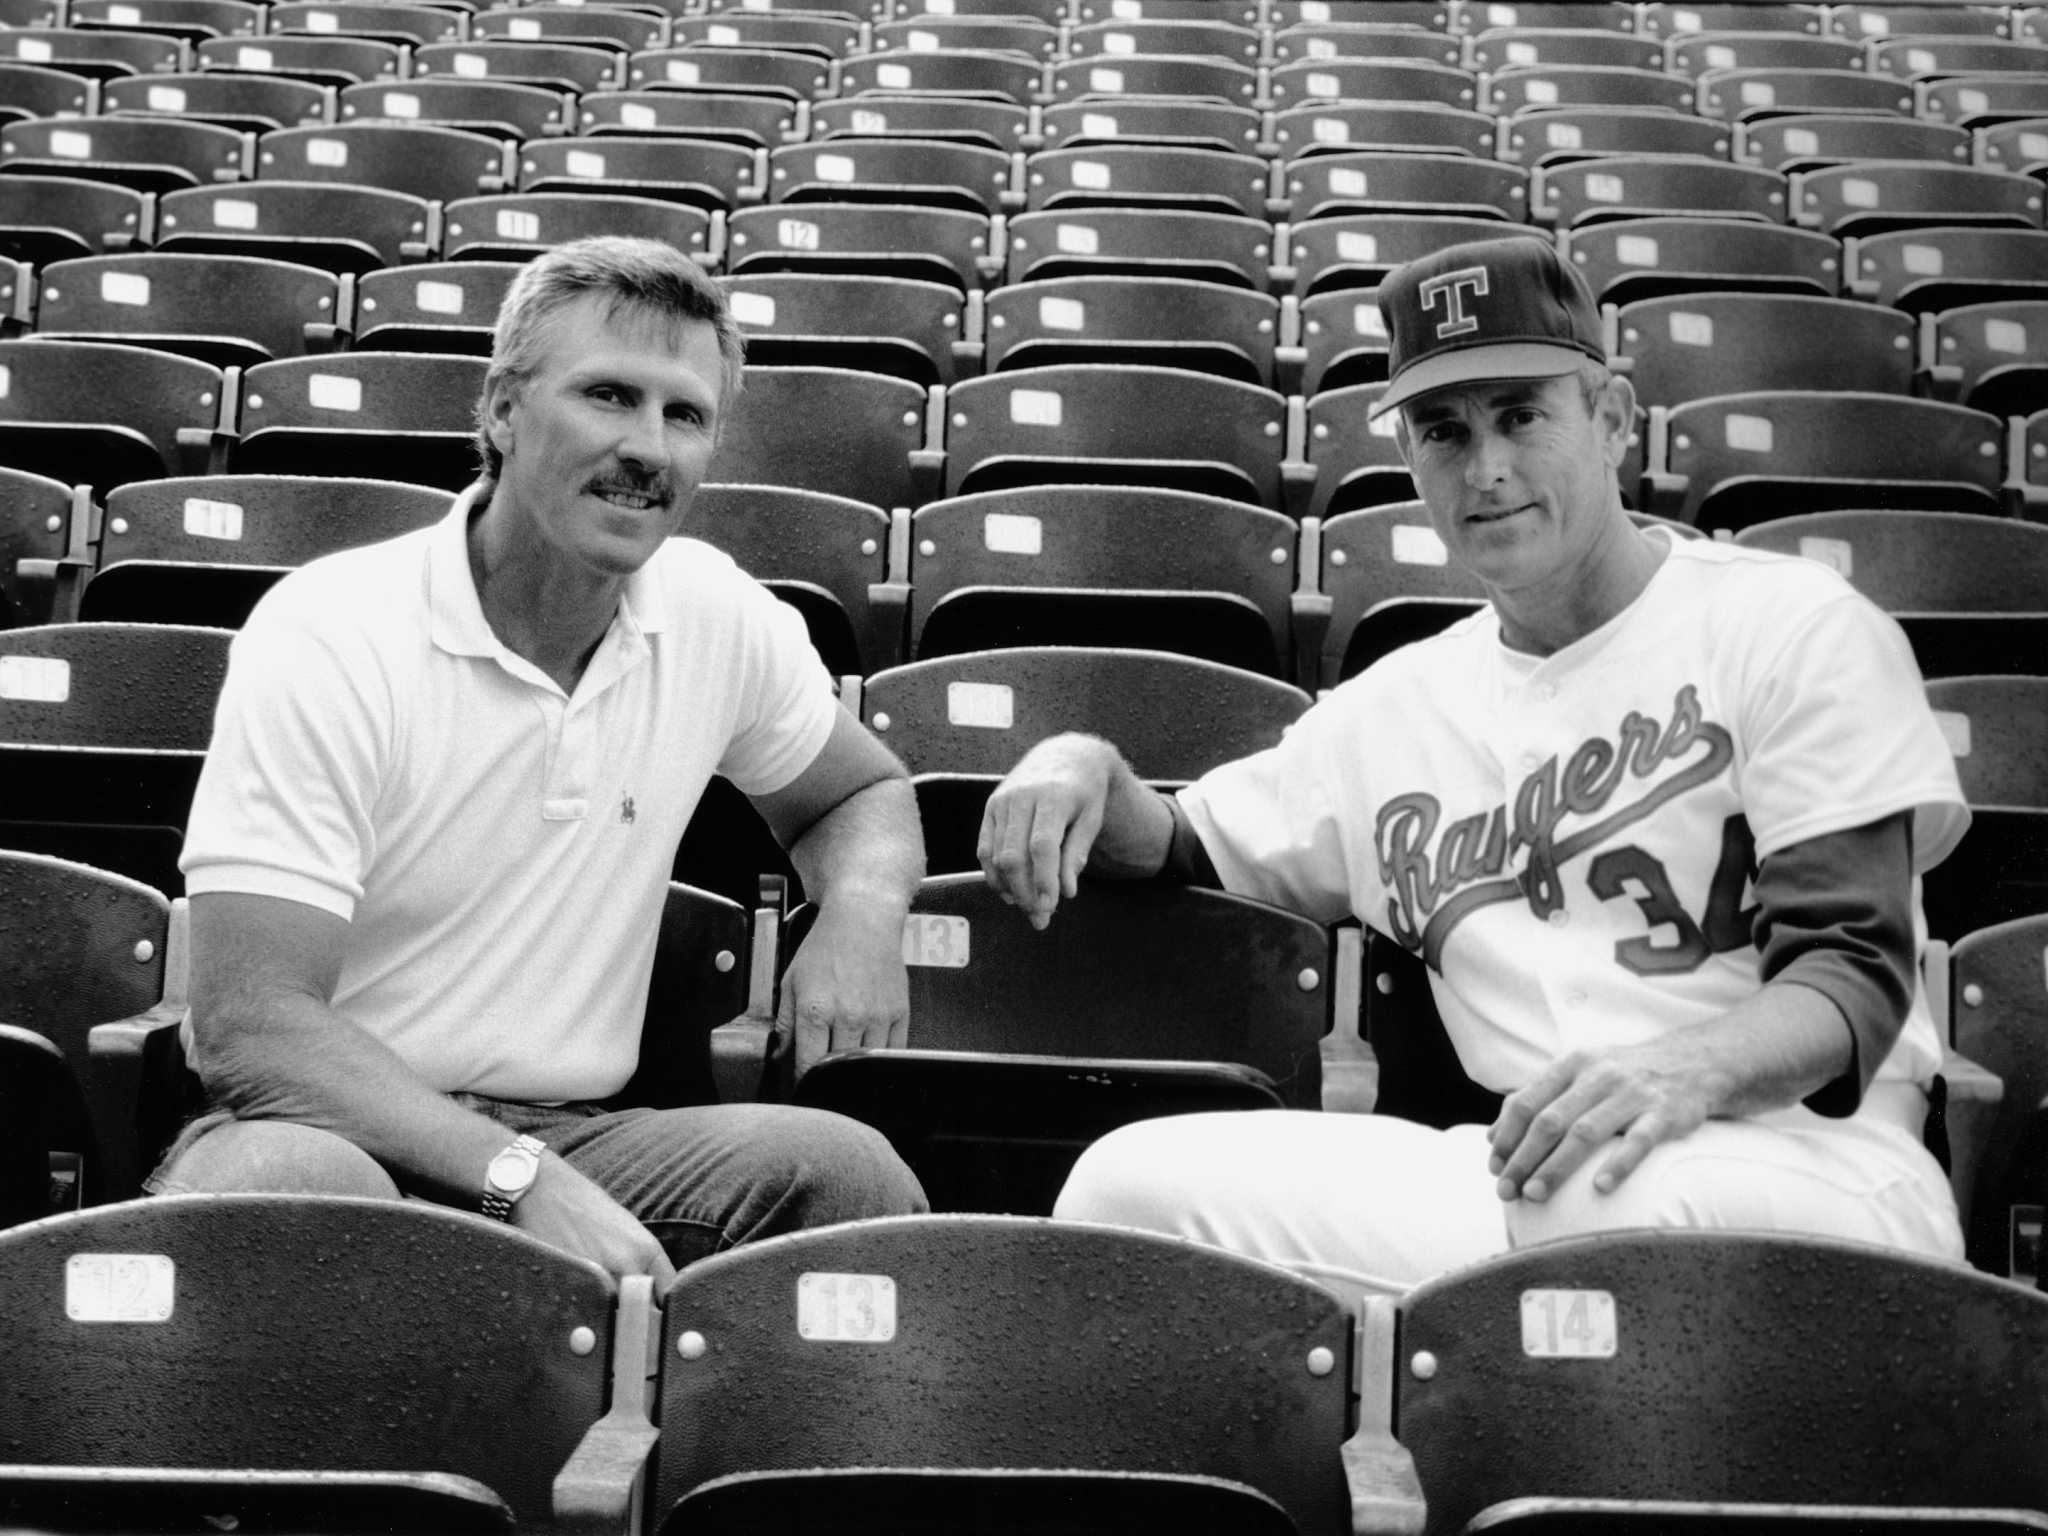 An ex-major leaguer lived a Hall of Fame life